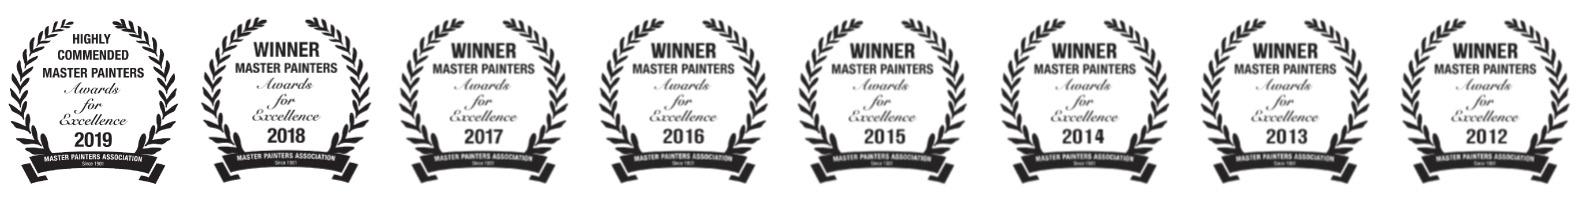 awards_emblems2019_1600